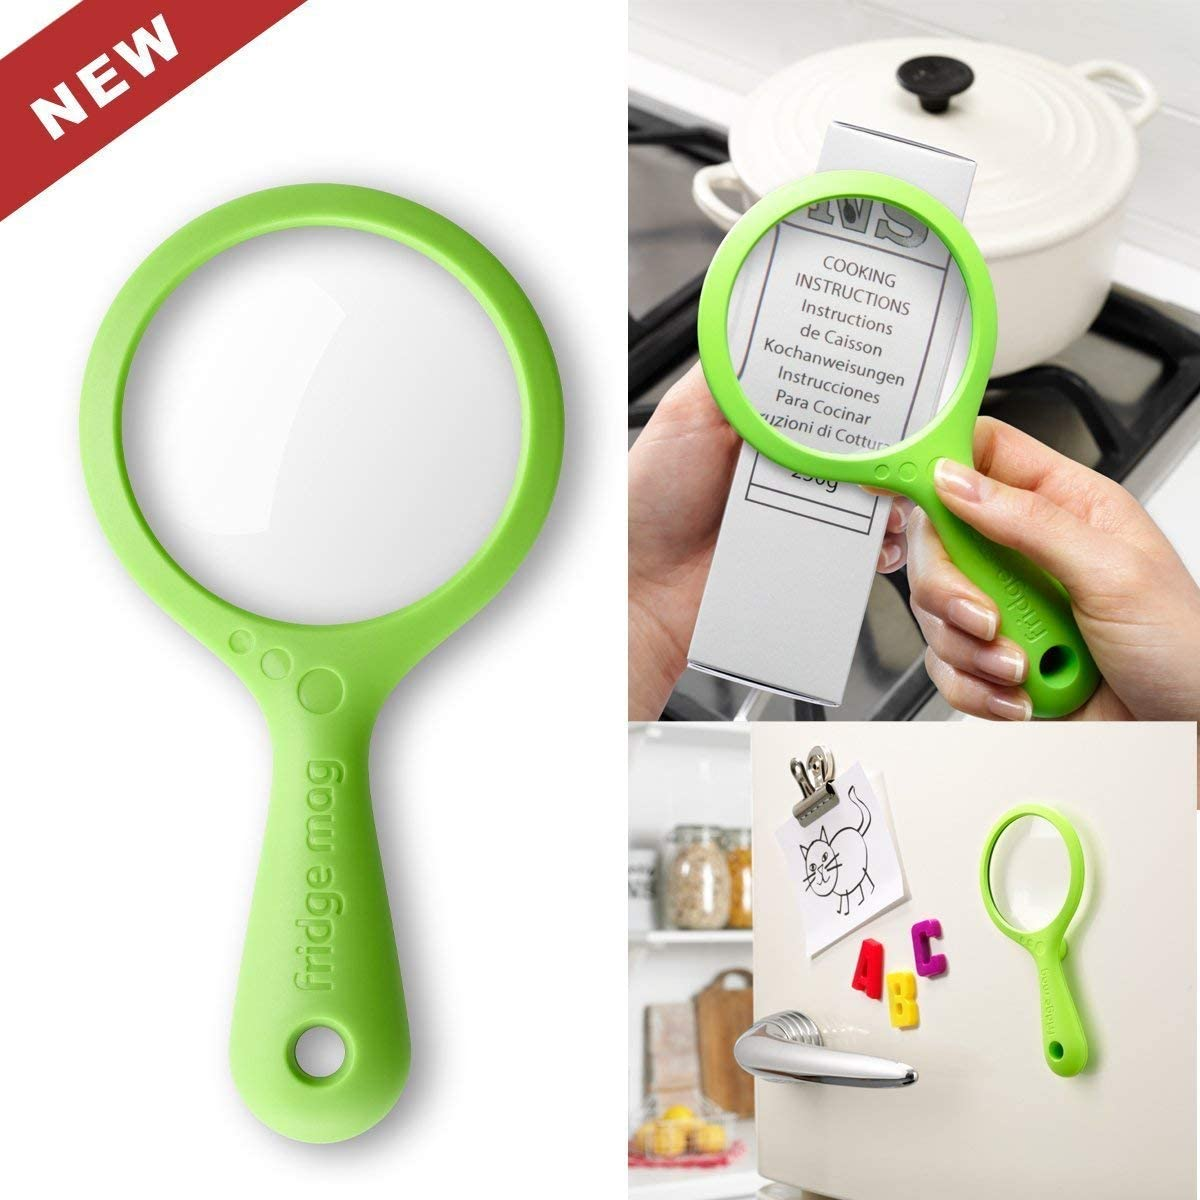 Green 1.9 x 8.5 x 17 cm New Soda Fridge Mag Magnetic Magnifying Glass